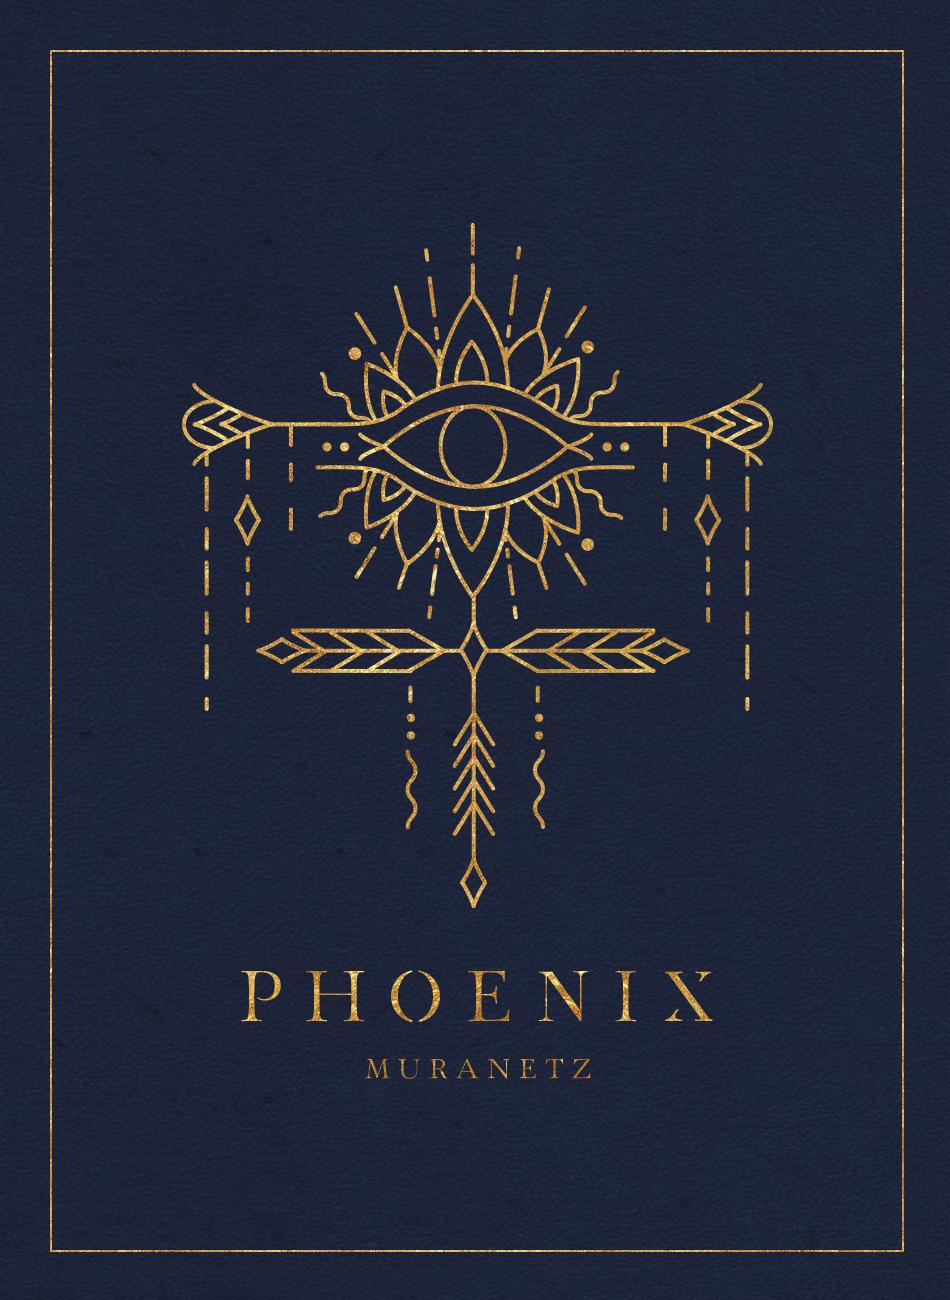 phoenix muranetz: branding by kelly james